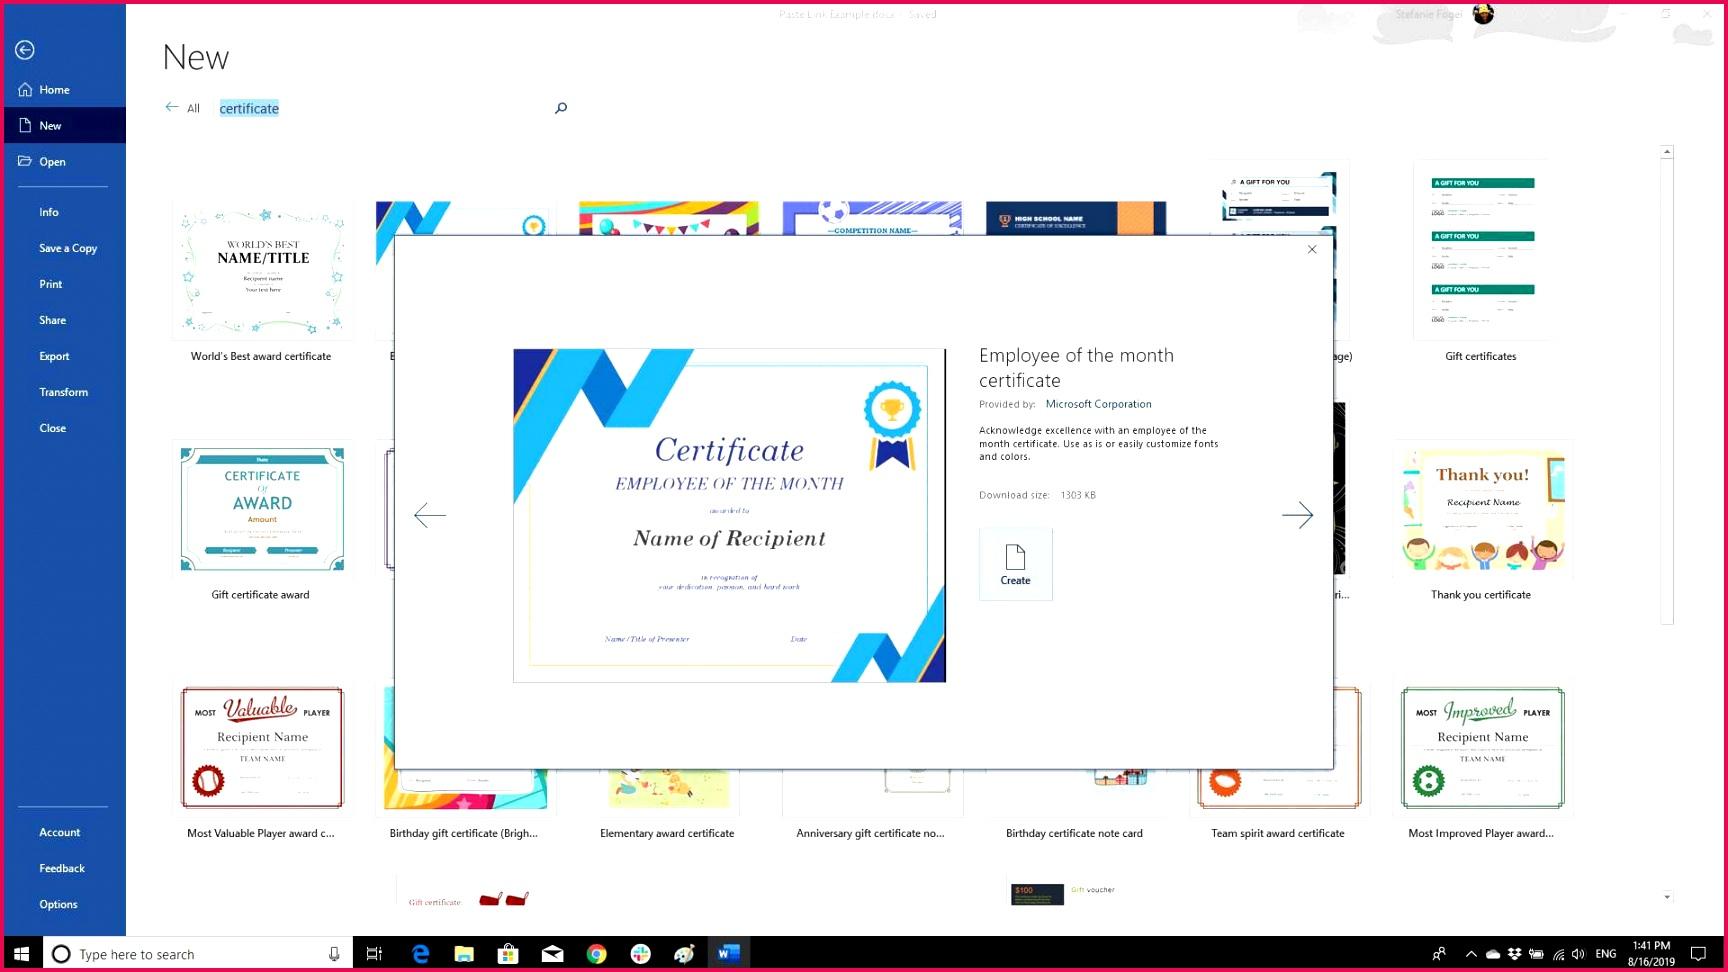 MSWordCertificateCreate 73afdb bddb8dc3380f3da5